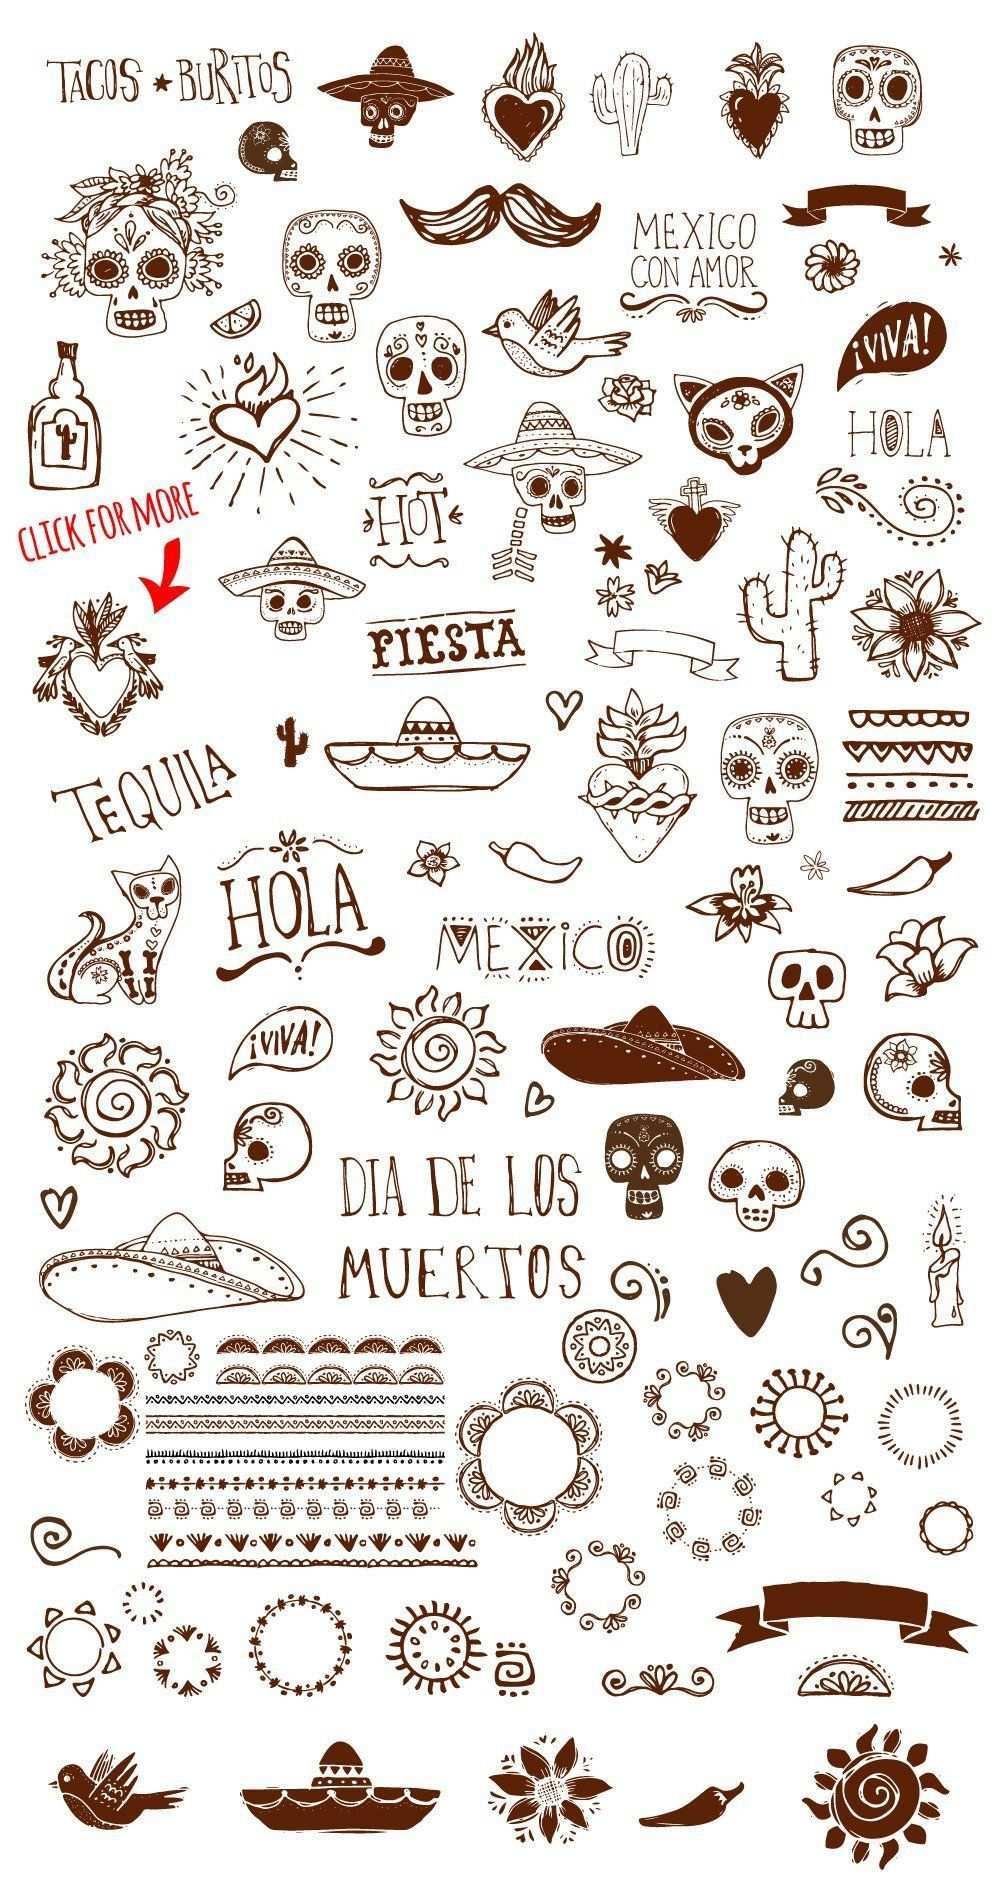 Tattoo Vorlagen Tattoo Templates How To Draw Hands Mexico Tattoo